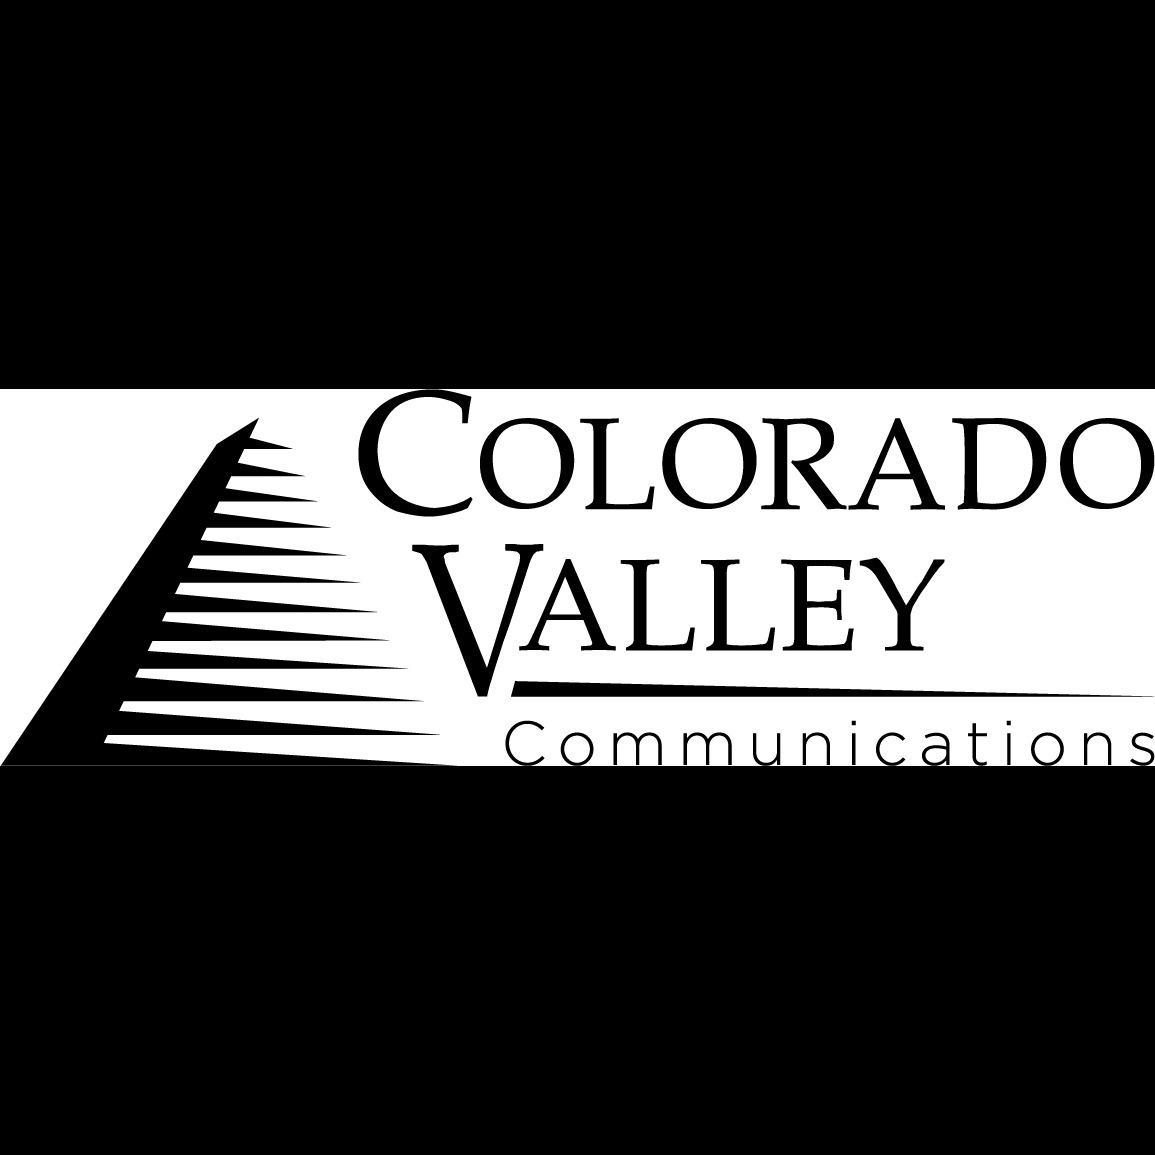 Colorado Valley Communications image 3